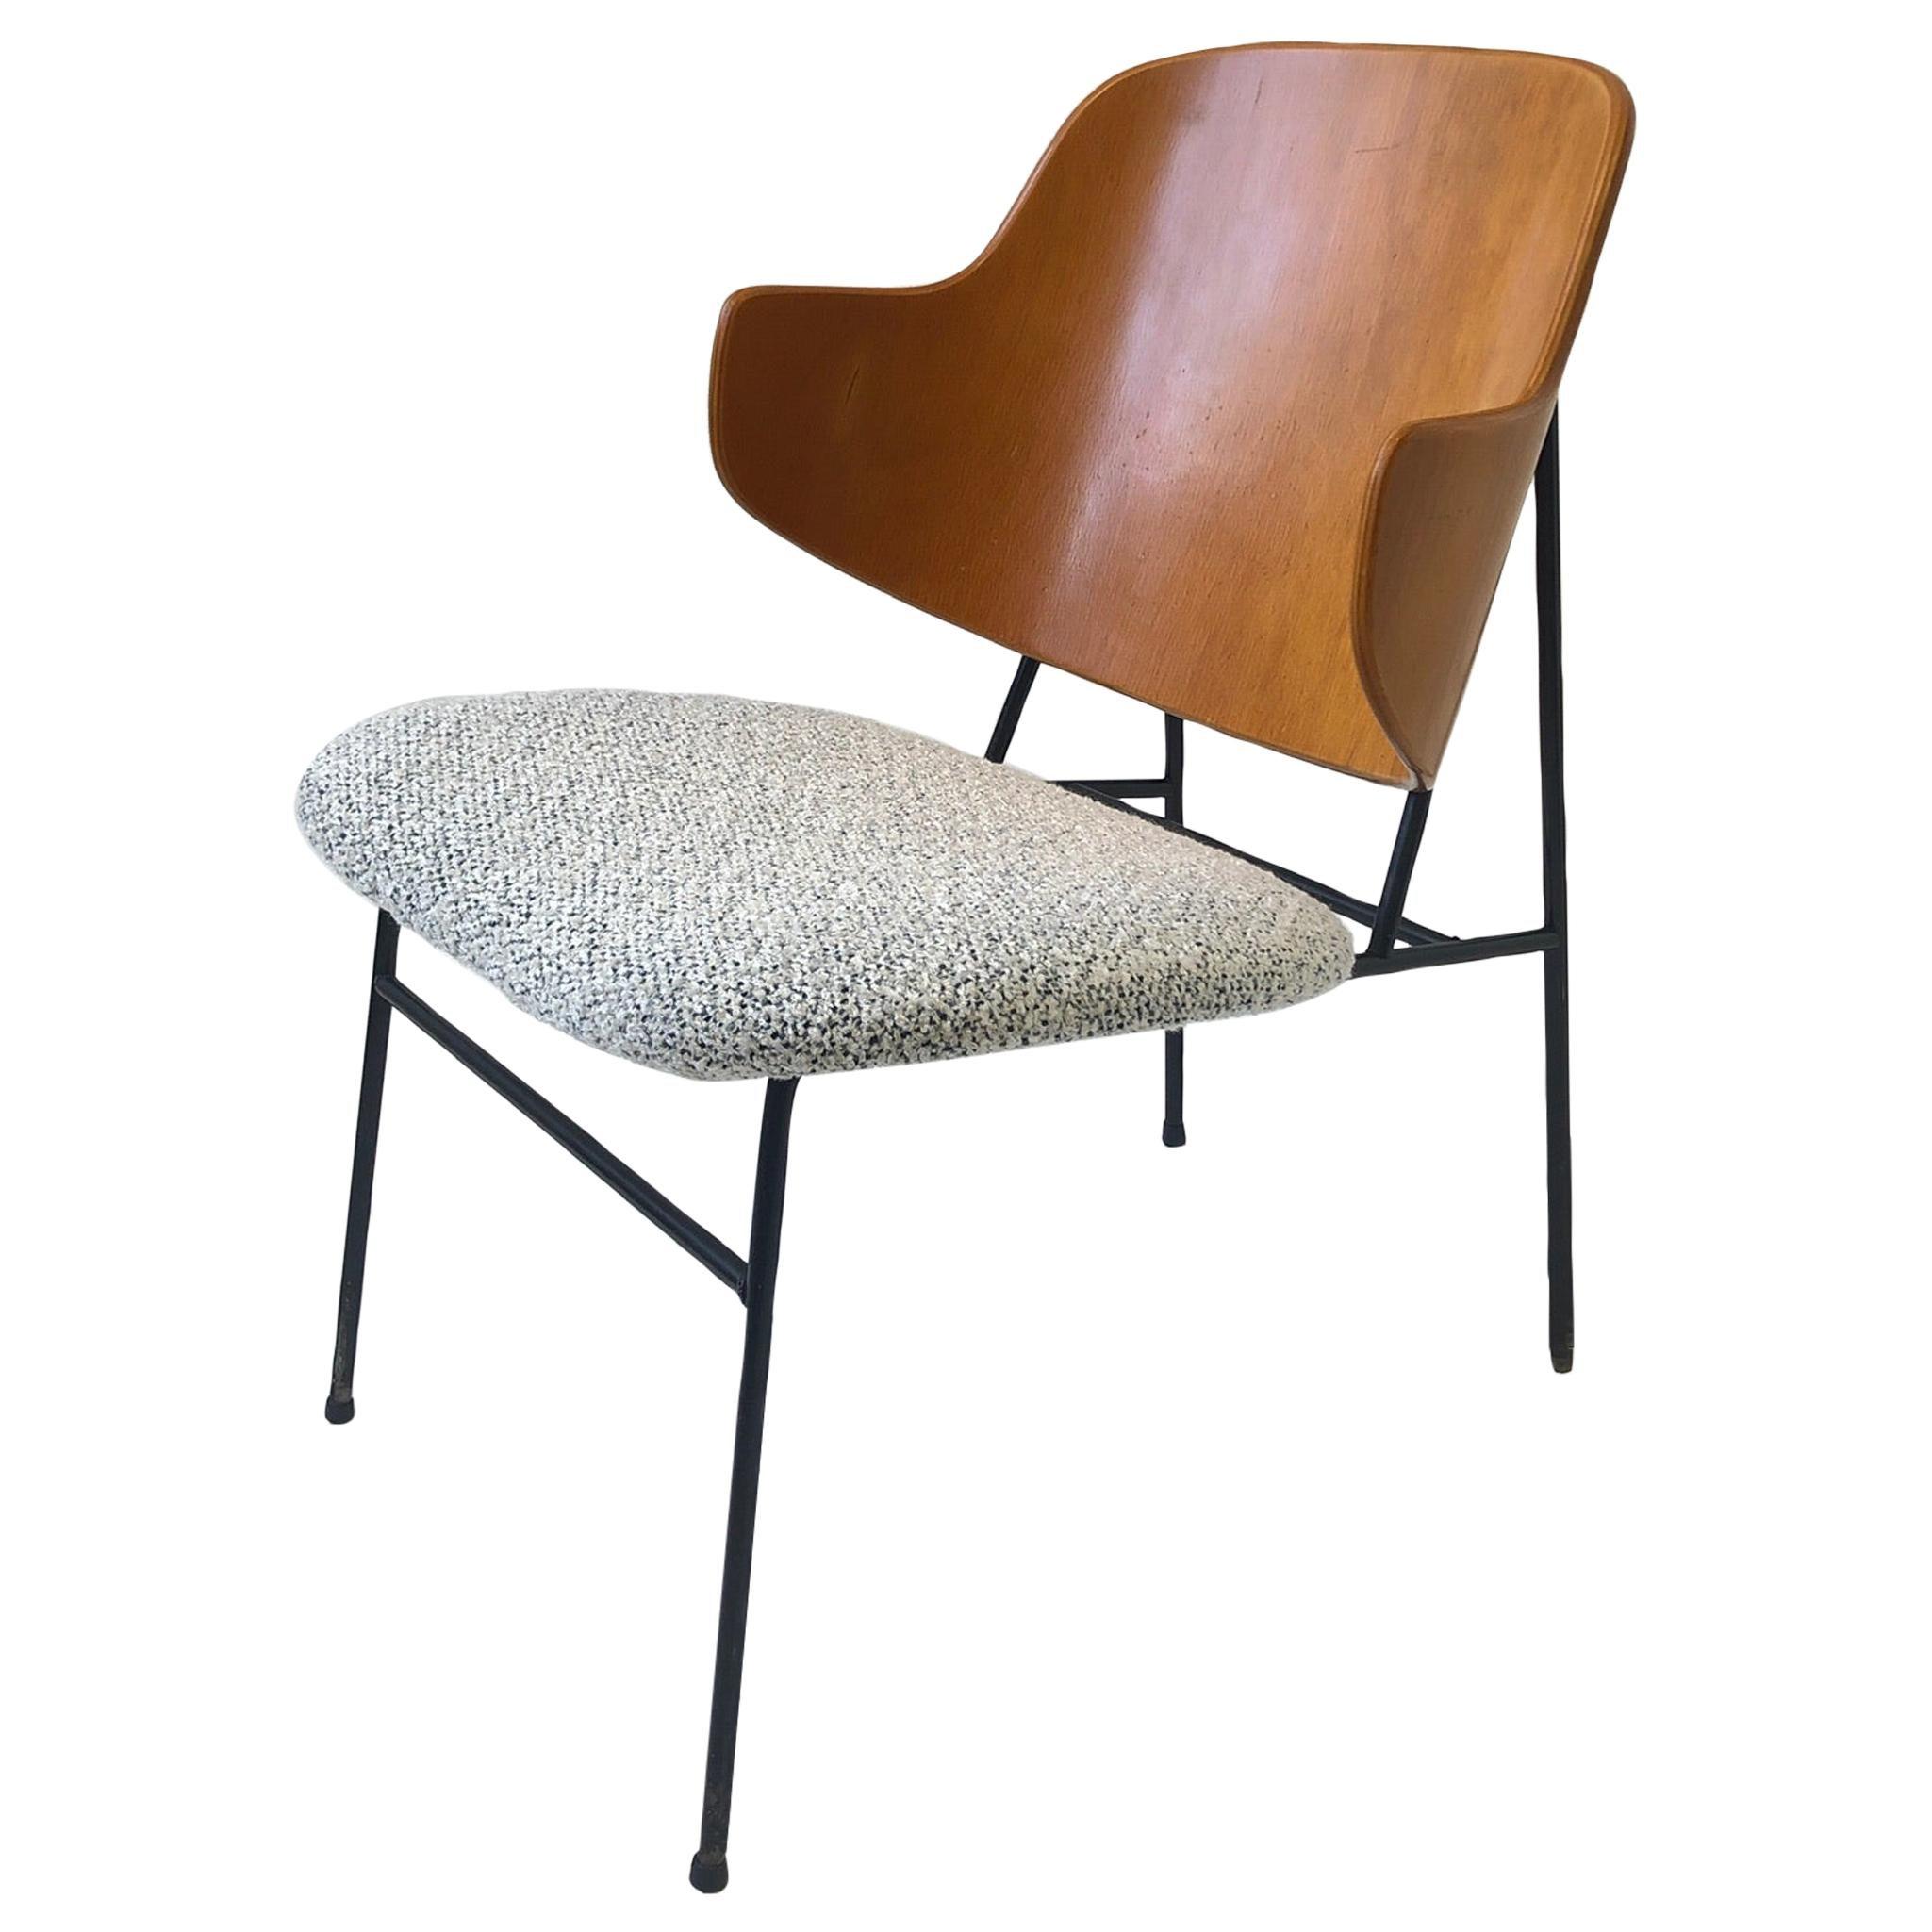 Danish Bentwood and Steel Frame Lounge Chair by Ib Kofod-Larsen